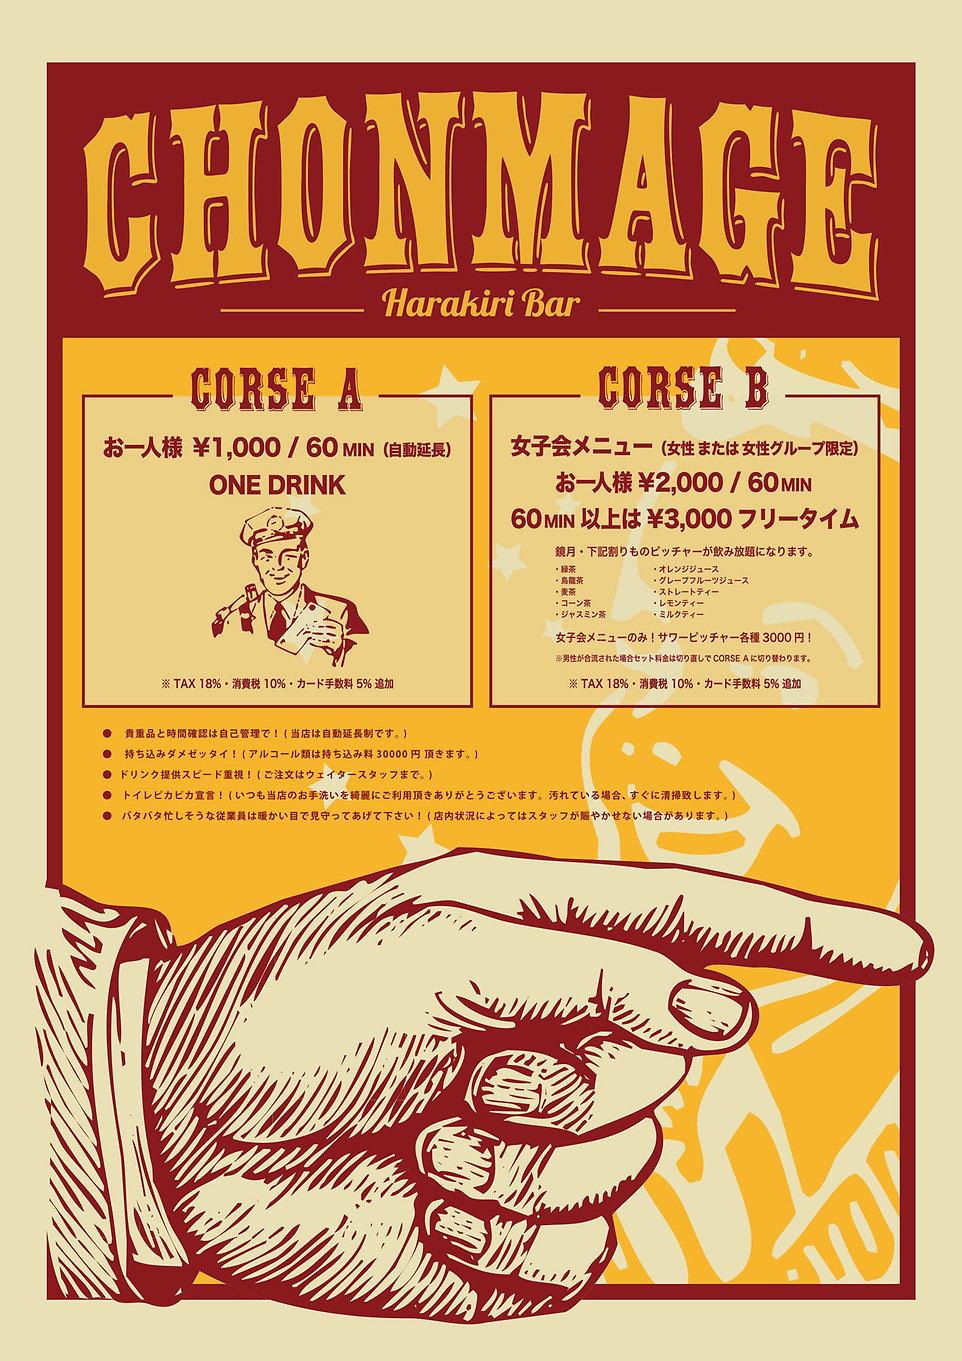 0327_CHONMAGE-_MENU_最終_OL-1.jpg